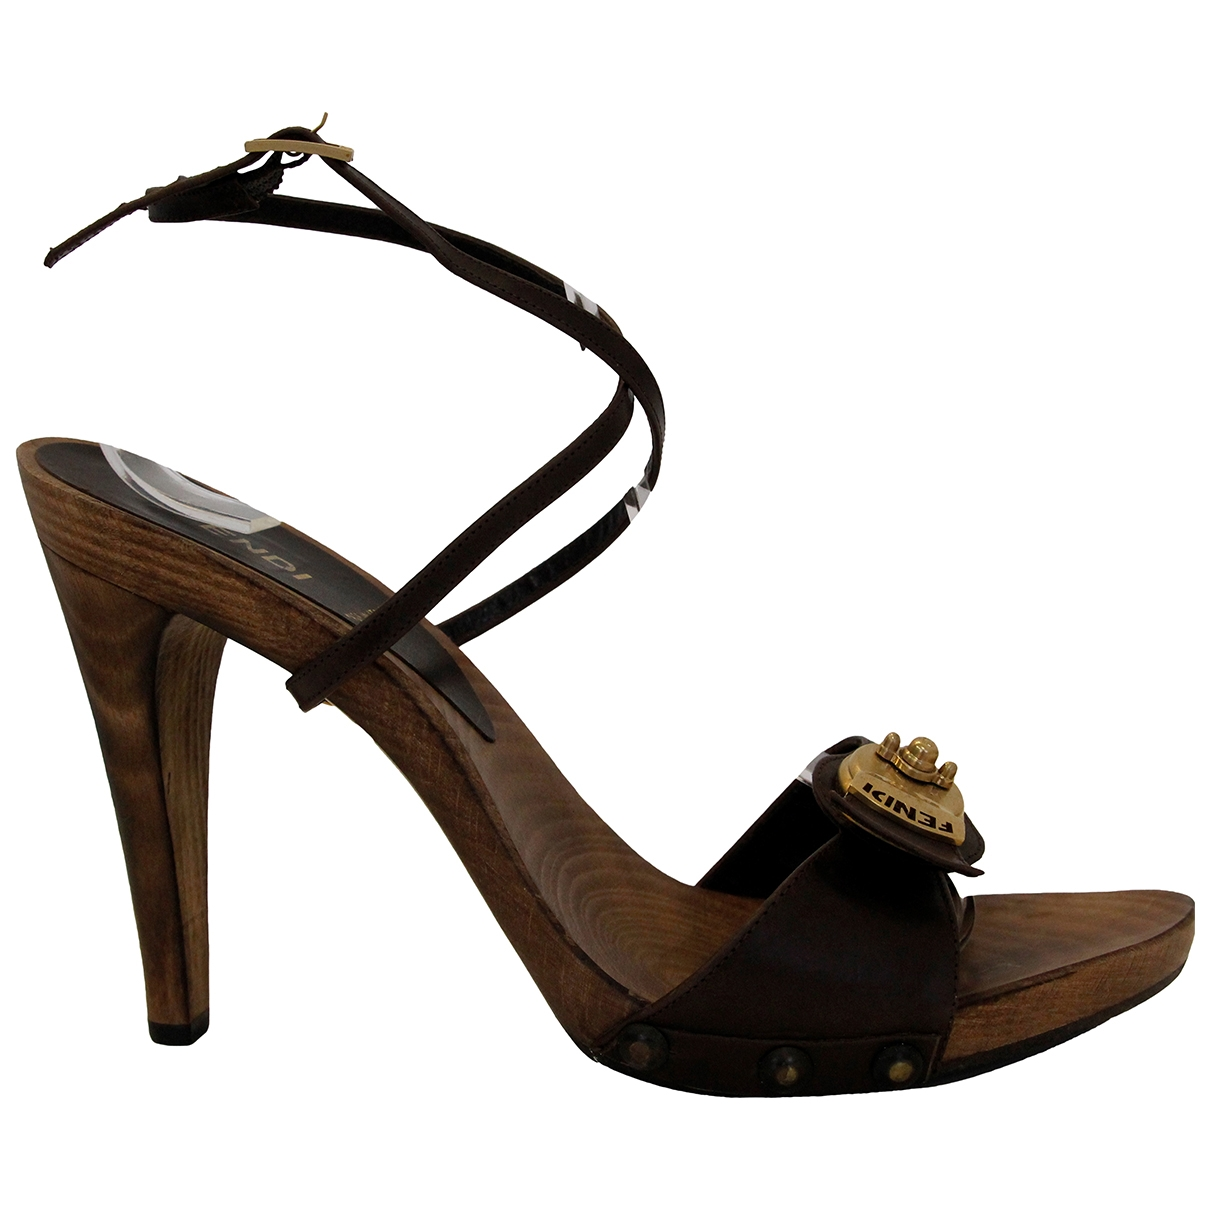 Fendi \N Brown Leather Mules & Clogs for Women 40 EU